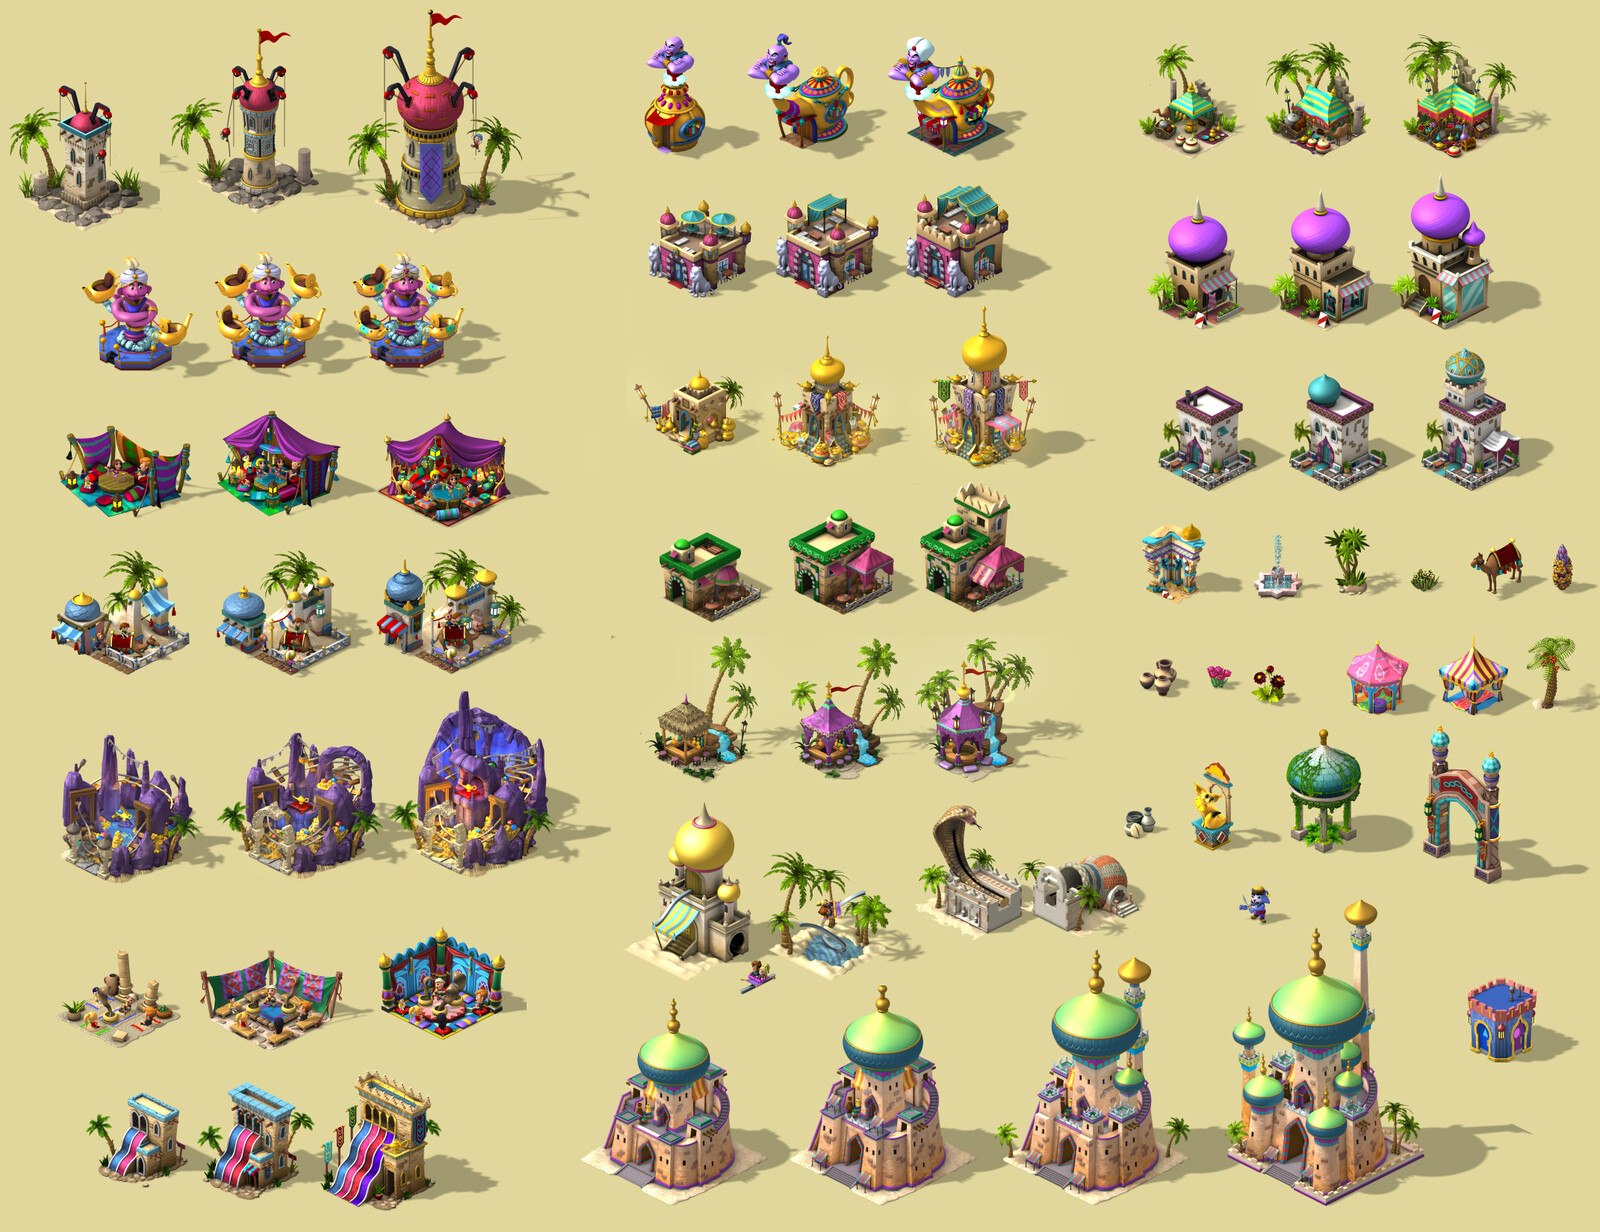 Arabia themed land tile set by various artist at Zynga